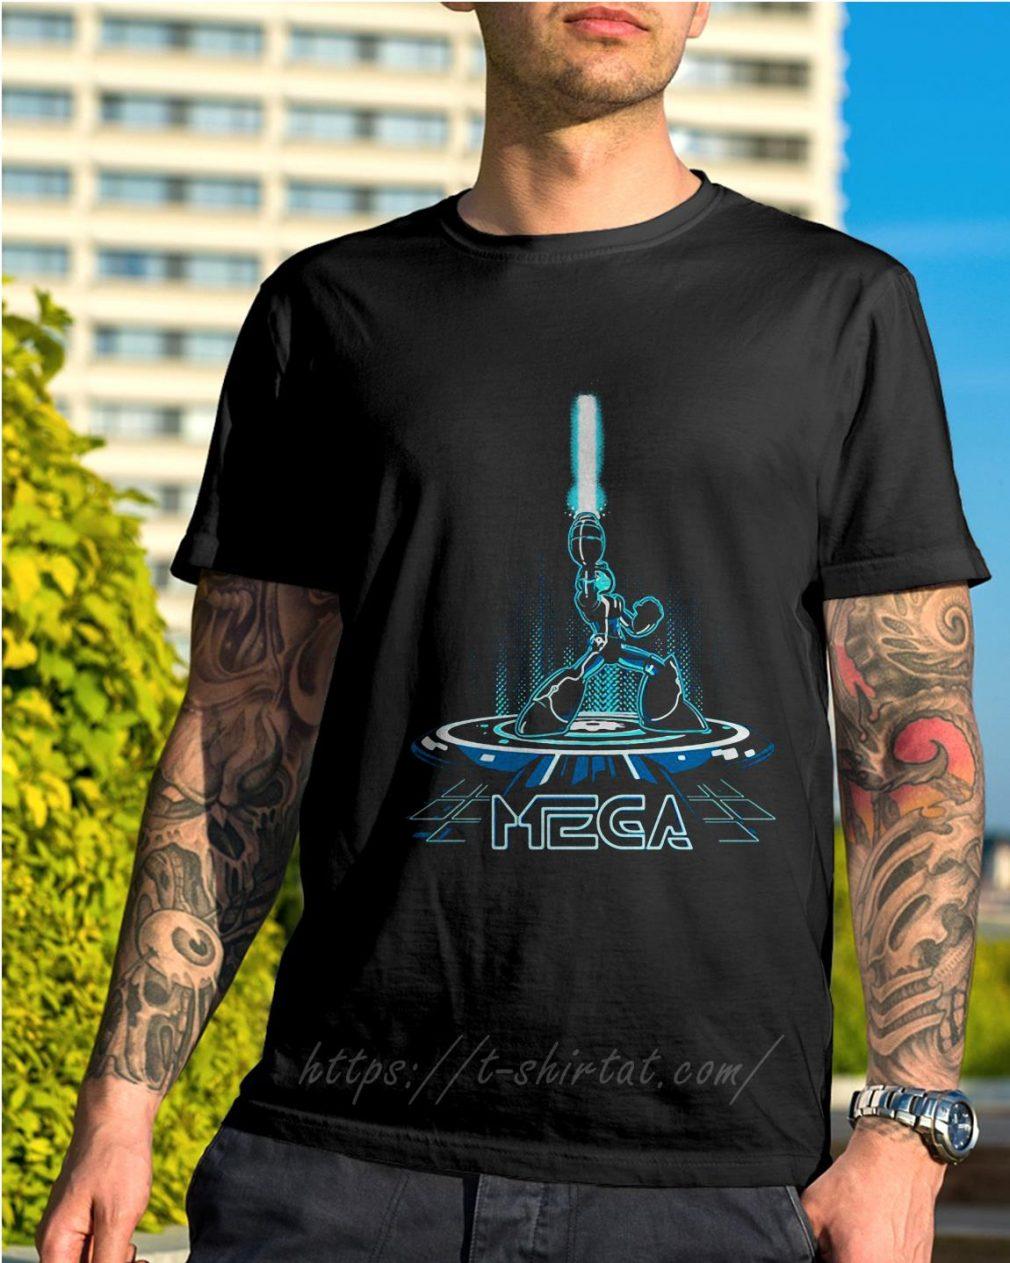 Funko Mega Man shirt